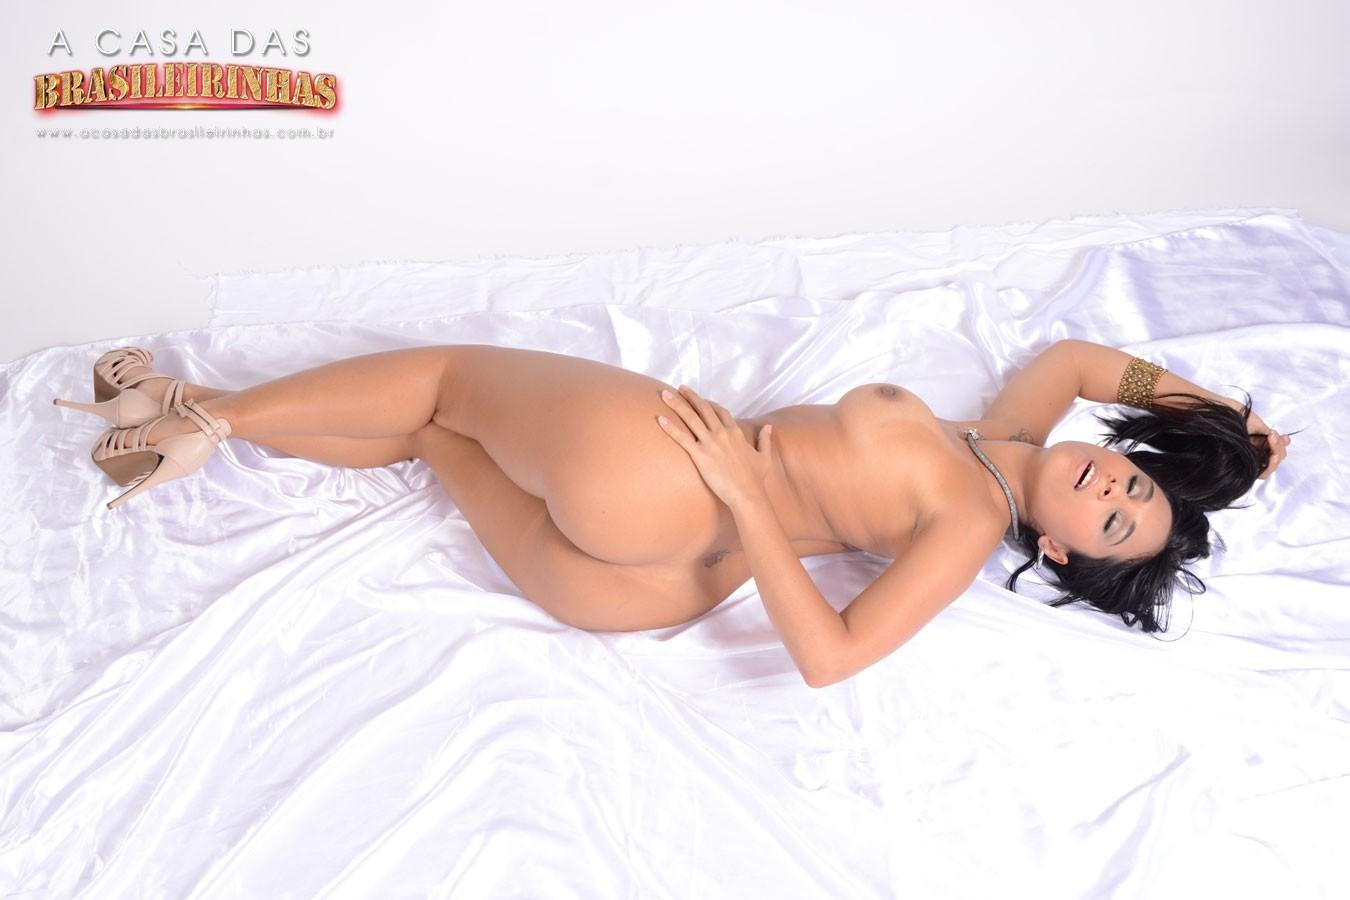 Alana-Freitas-deitada-bem-gostosa.jpg